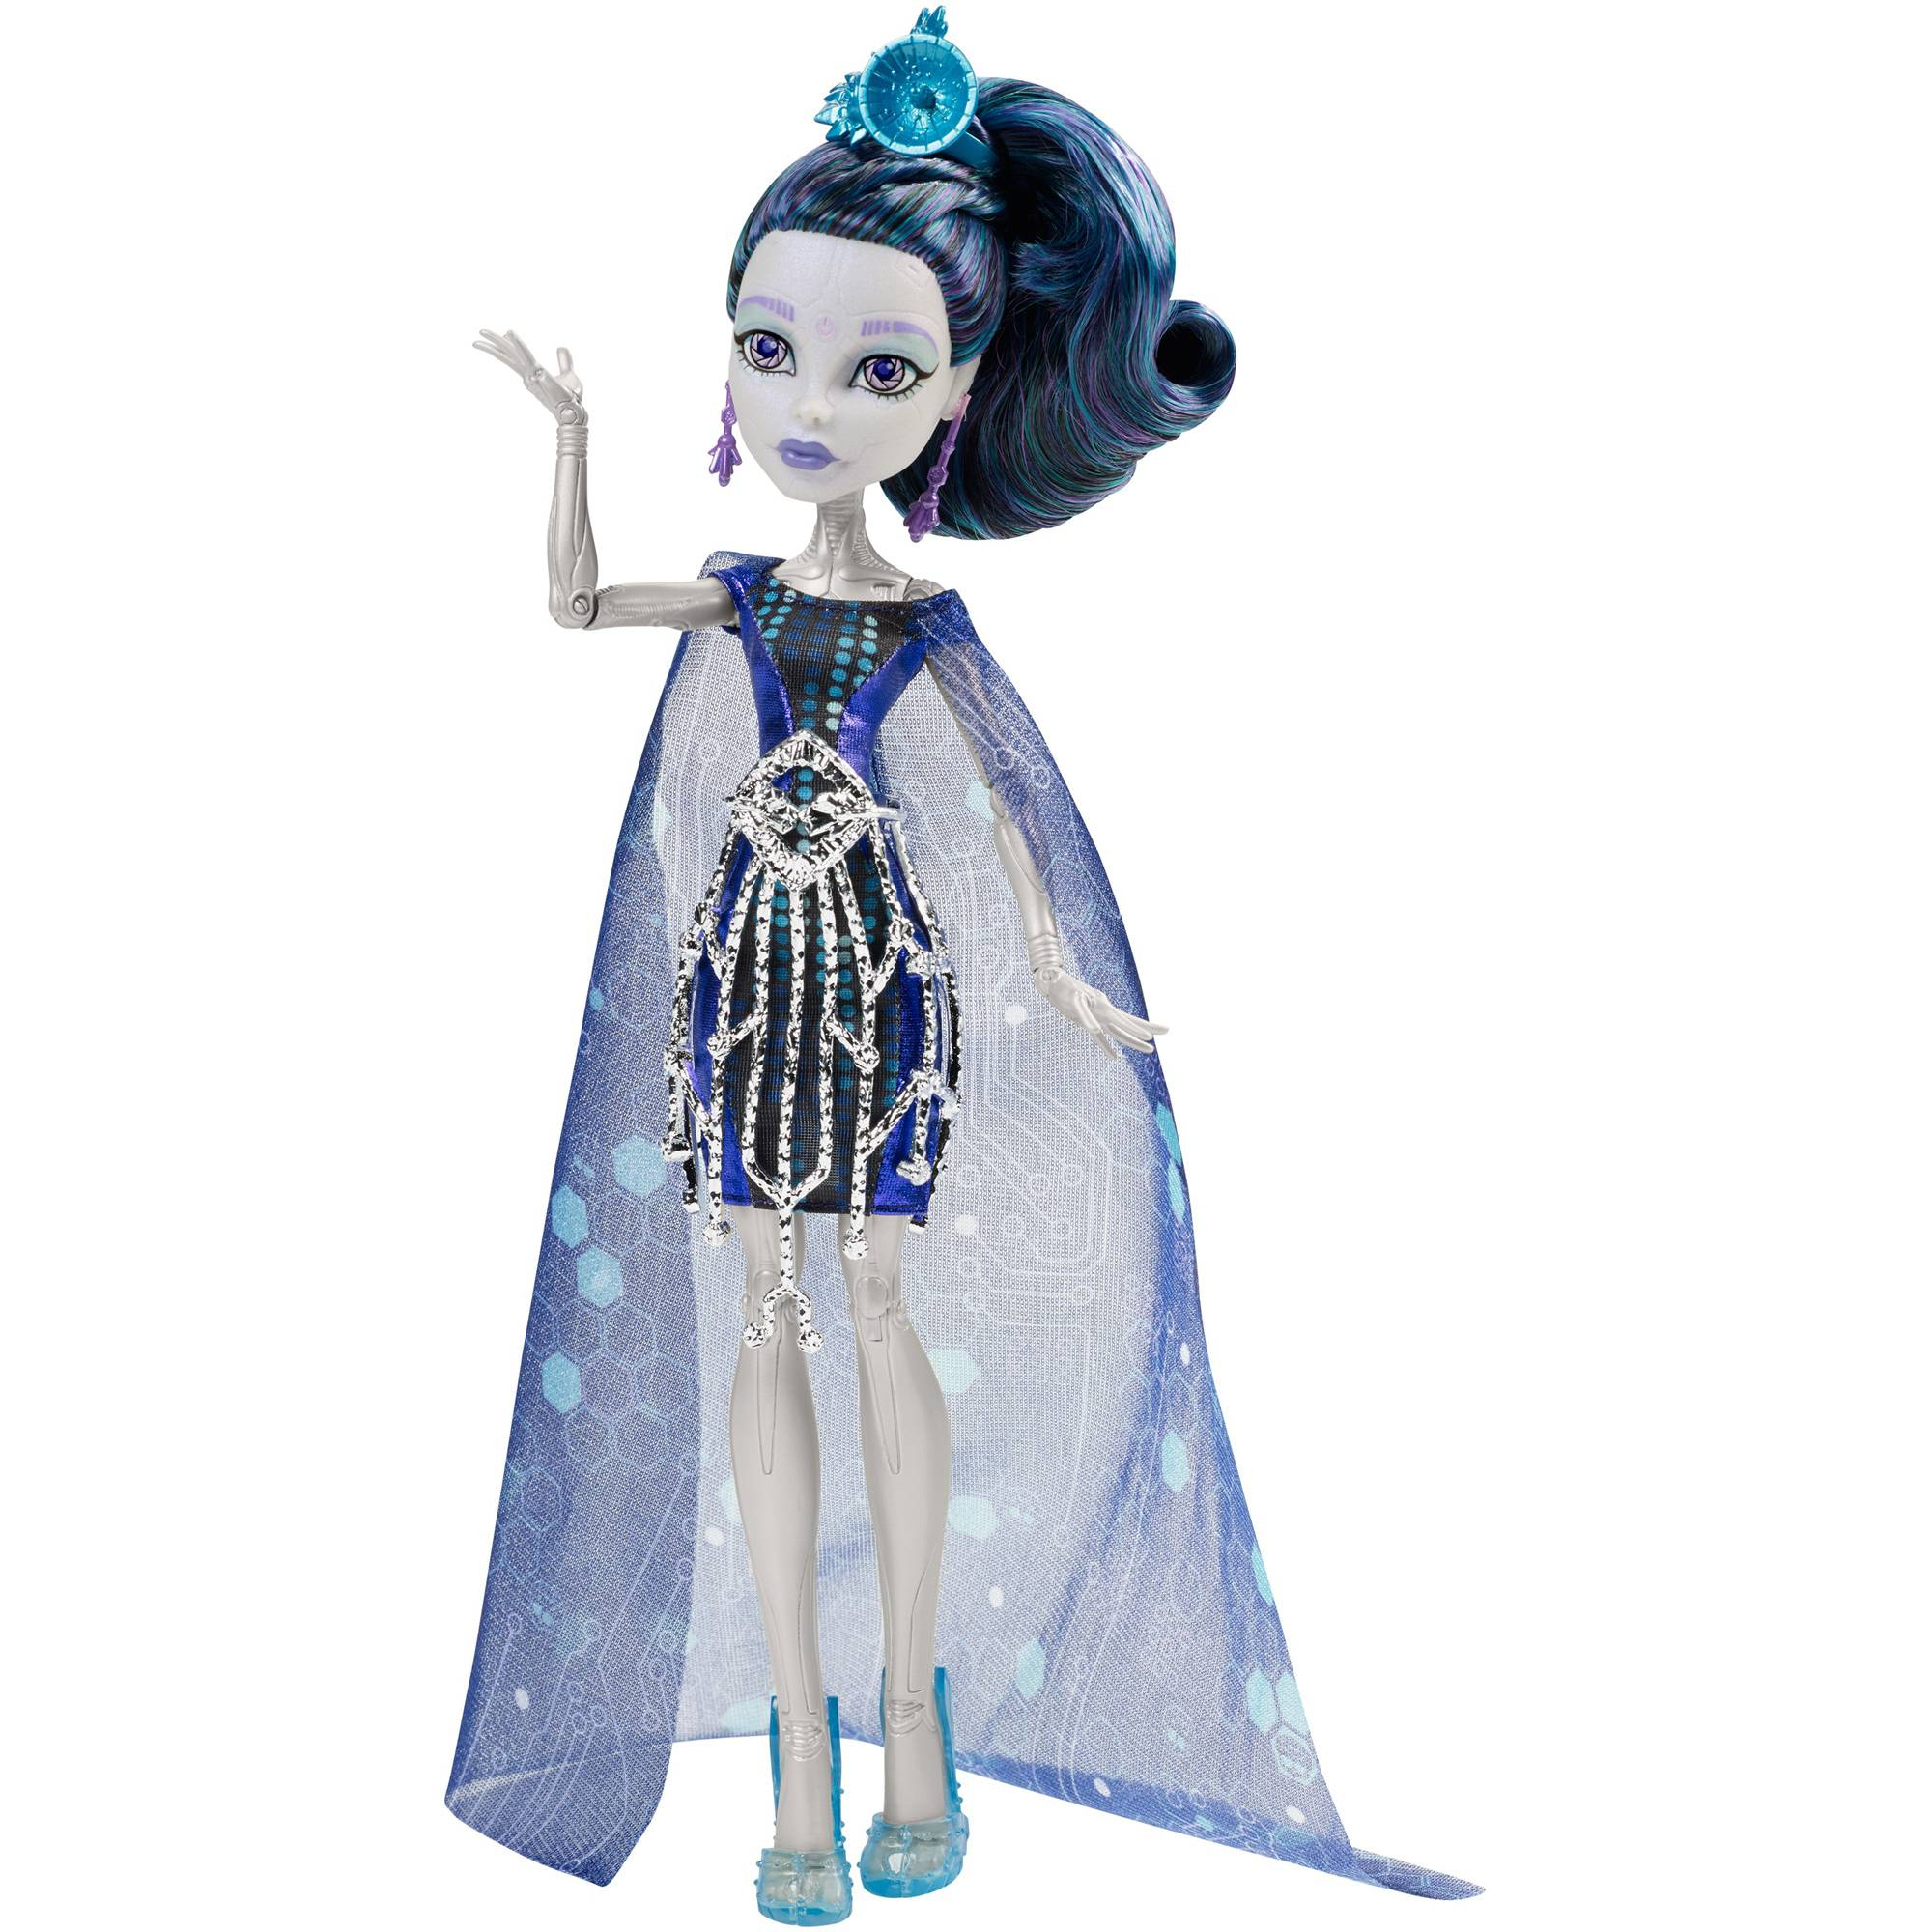 Monster High Boo York Elle Eedee Doll